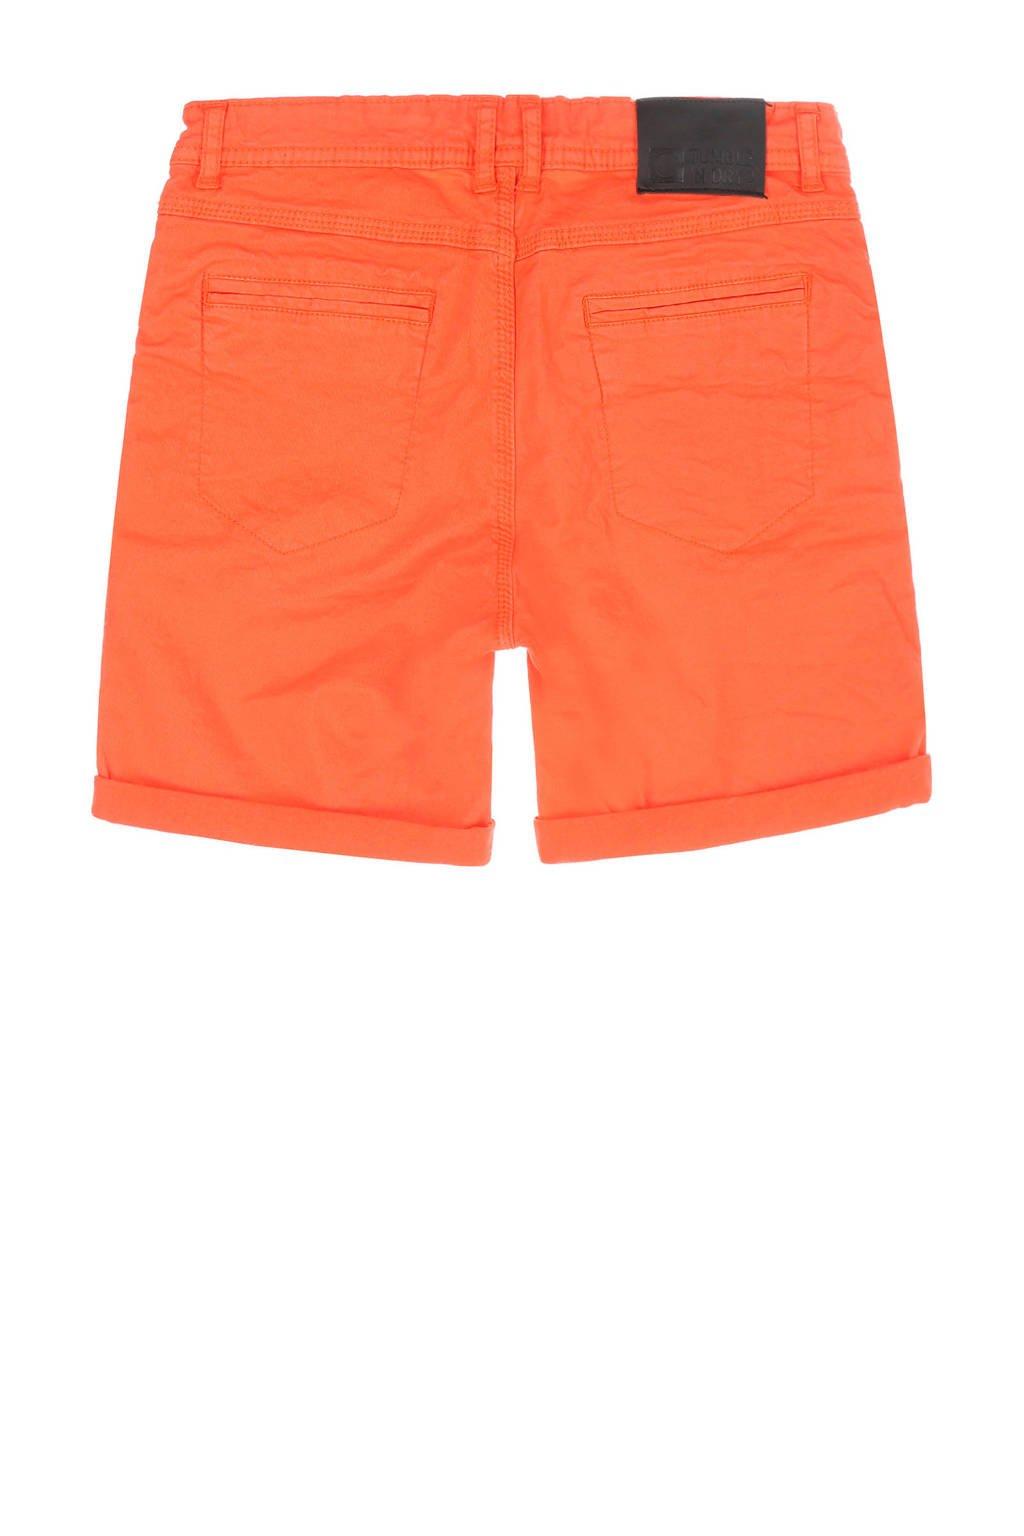 Tumble 'n Dry Mid slim fit short Granson beige, Oranje